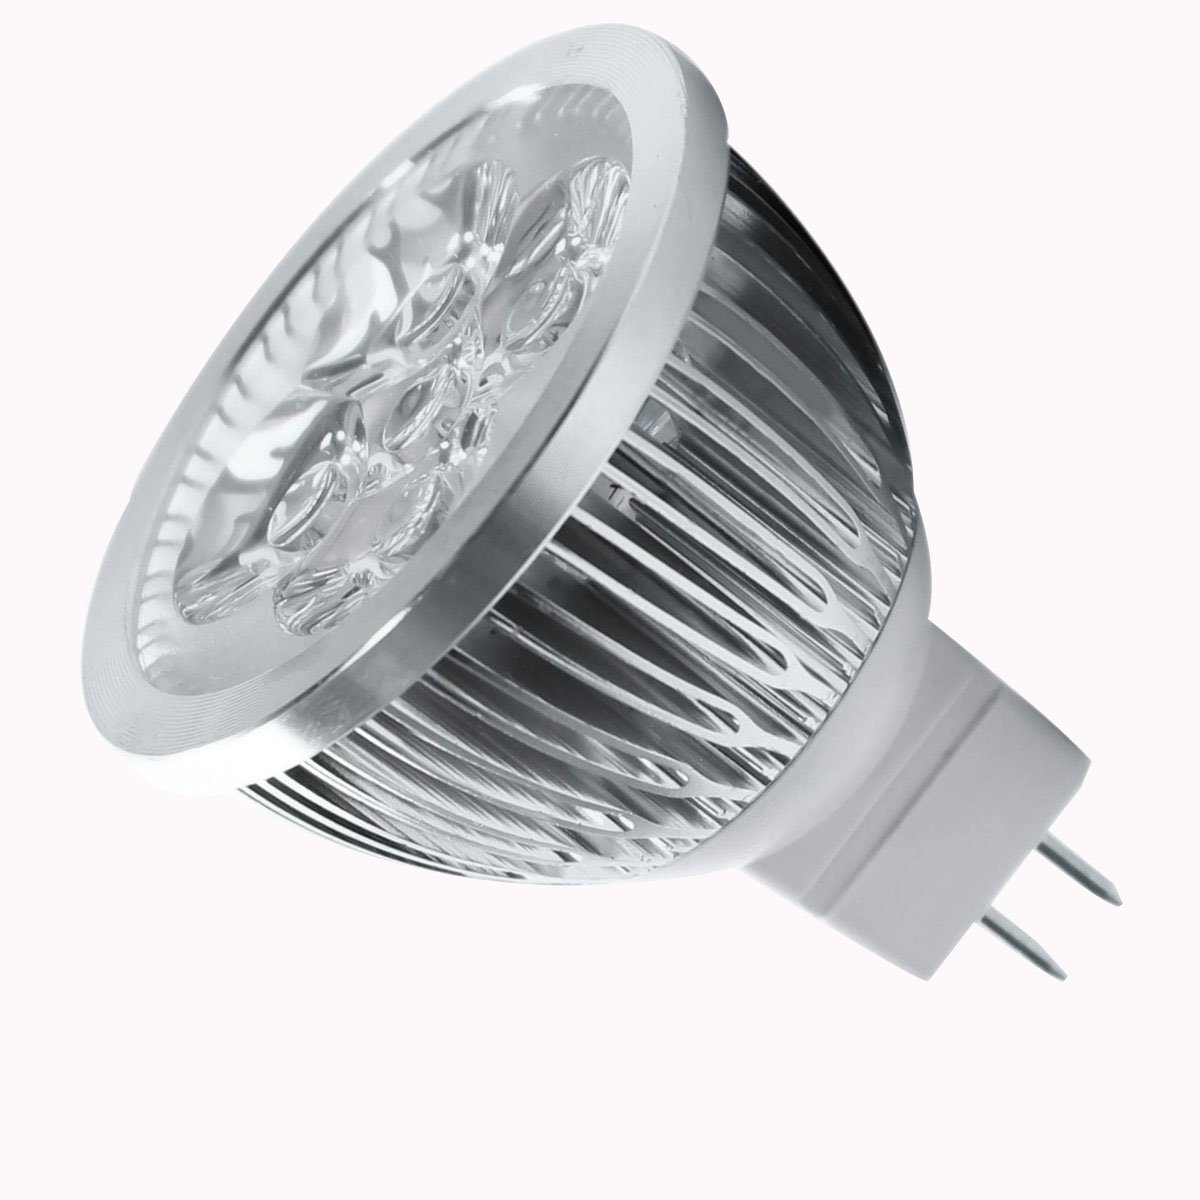 TOOGOO(R) 4W Dimmable MR16 LED Bulb/3200K Warm White LED Spotlight/50 Watt Equivalent Bi Pin GU5.3 Base/330 Lumen 60 Degree Beam Angle for Landscape, Accent, Recessed, Track Lighting